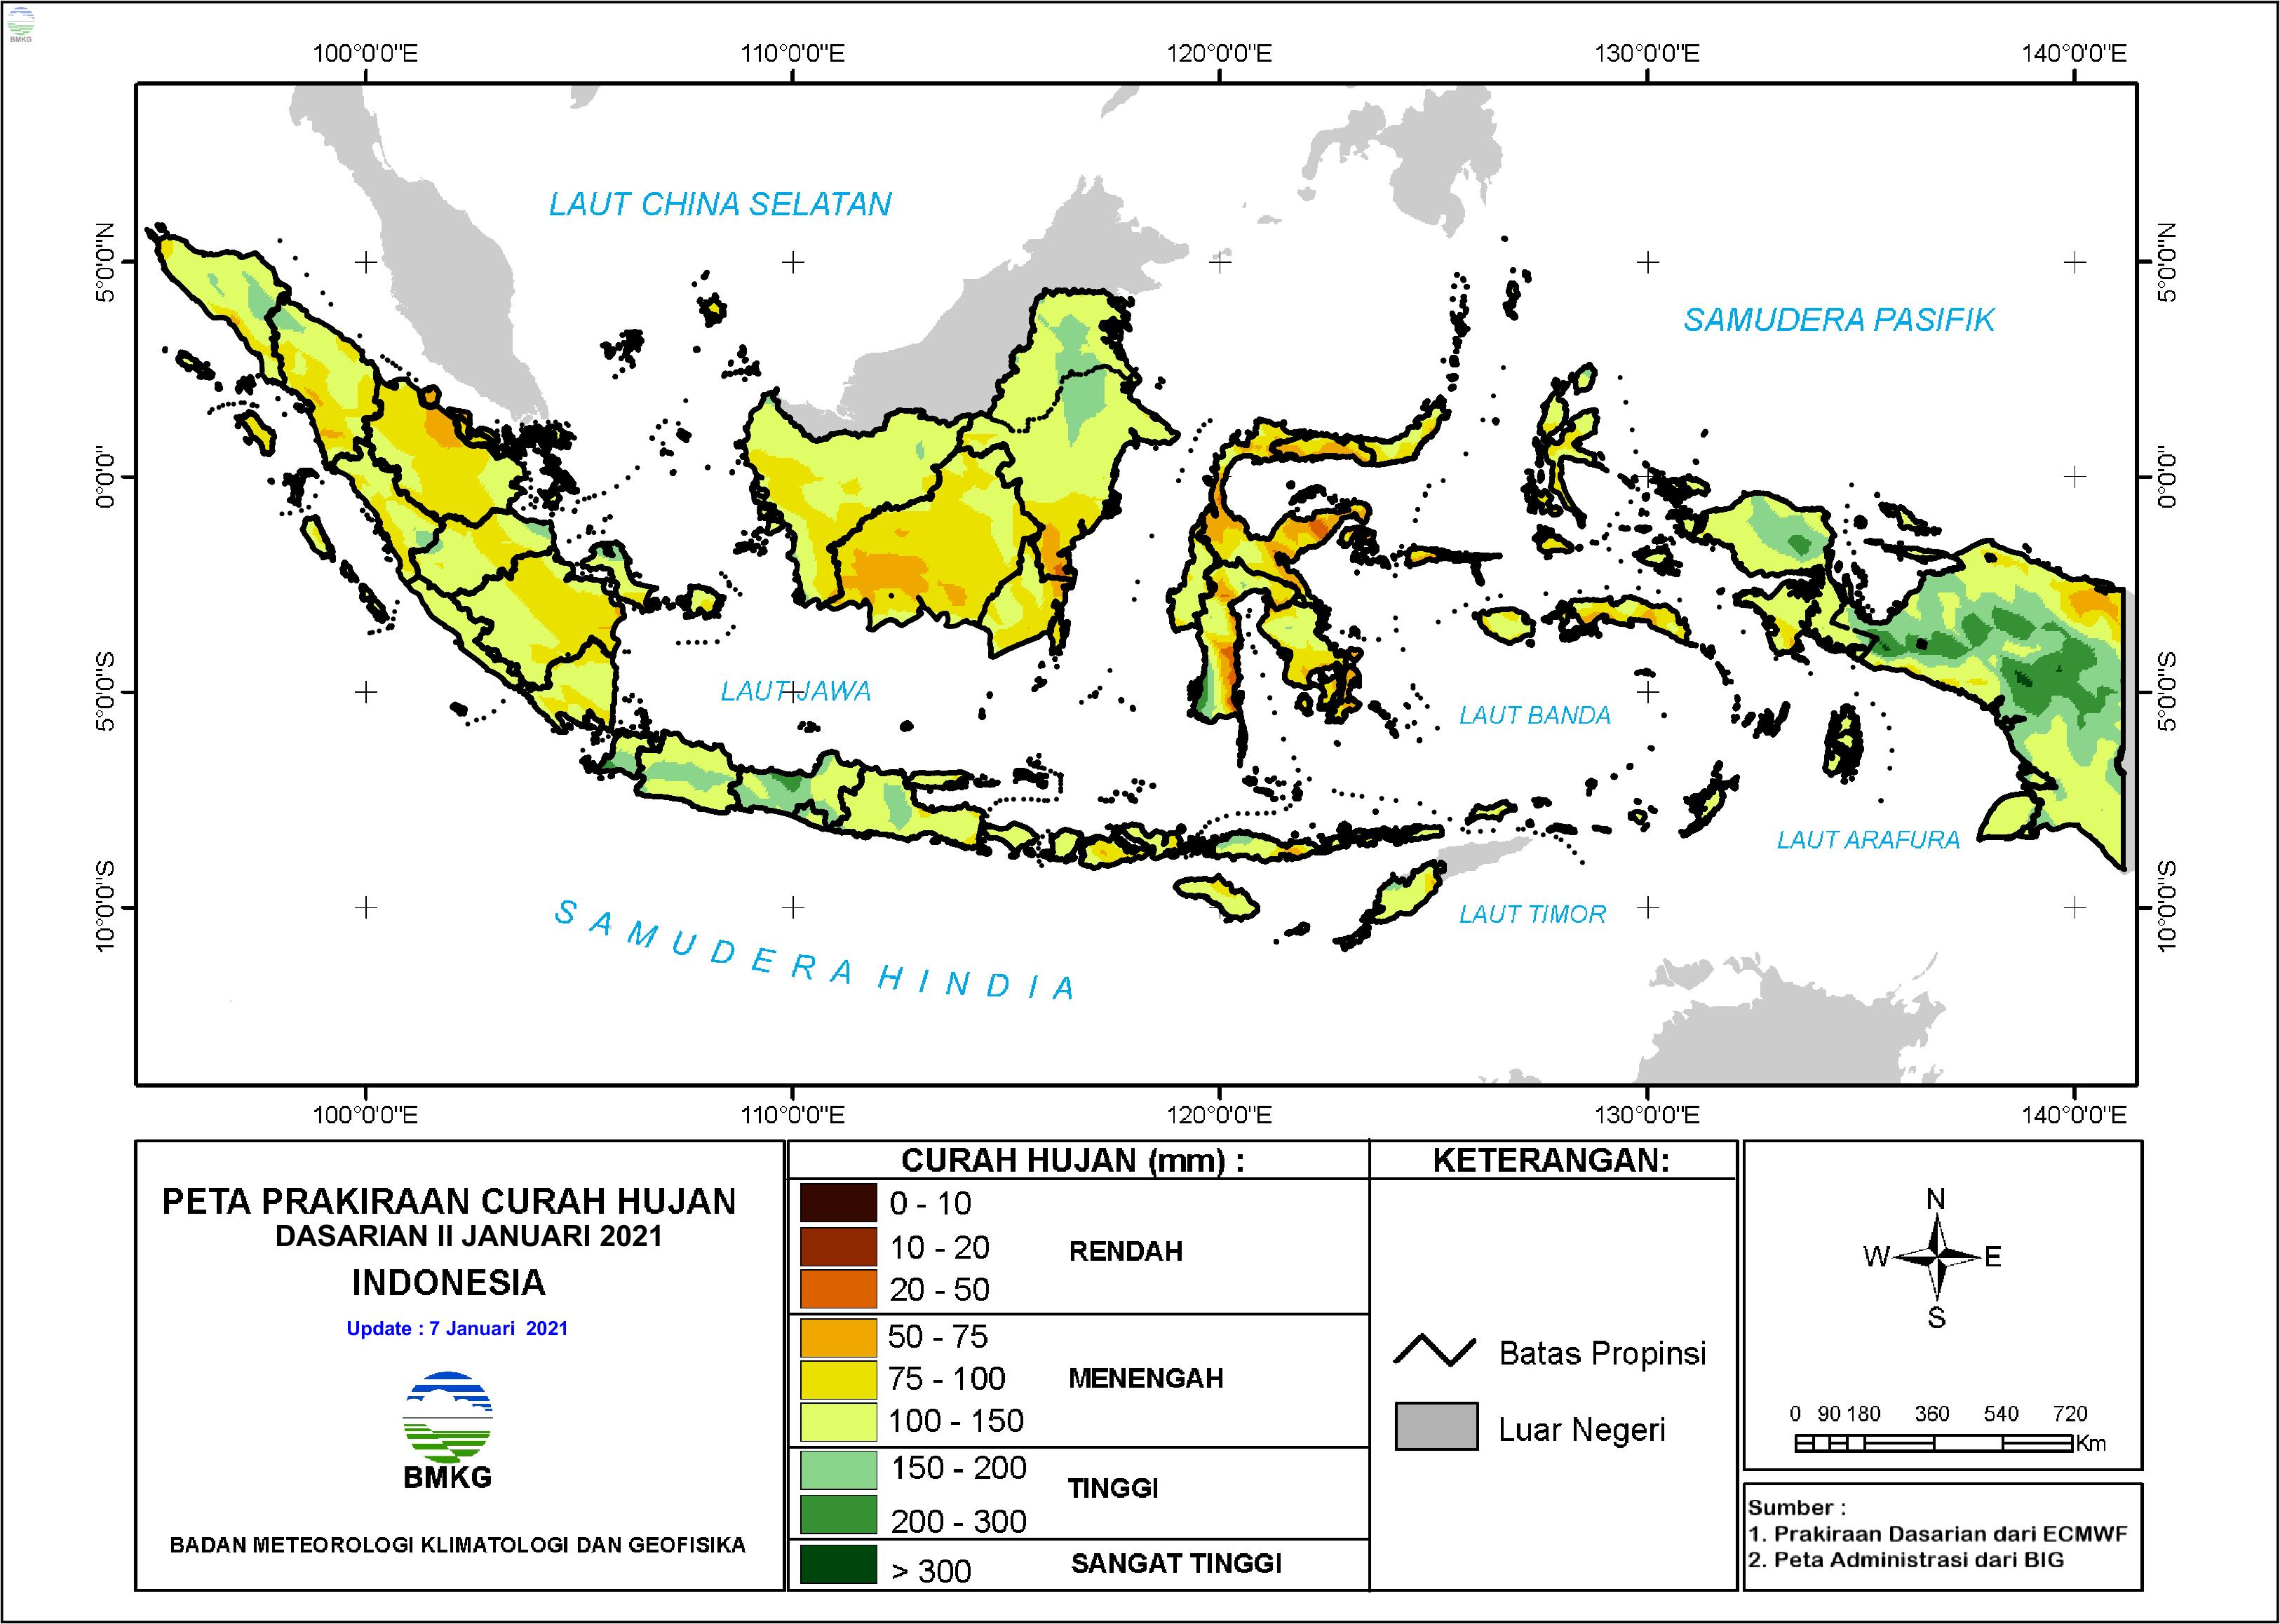 Prakiraan Curah Hujan Dasarian II-III Januari dan I Februari 2021